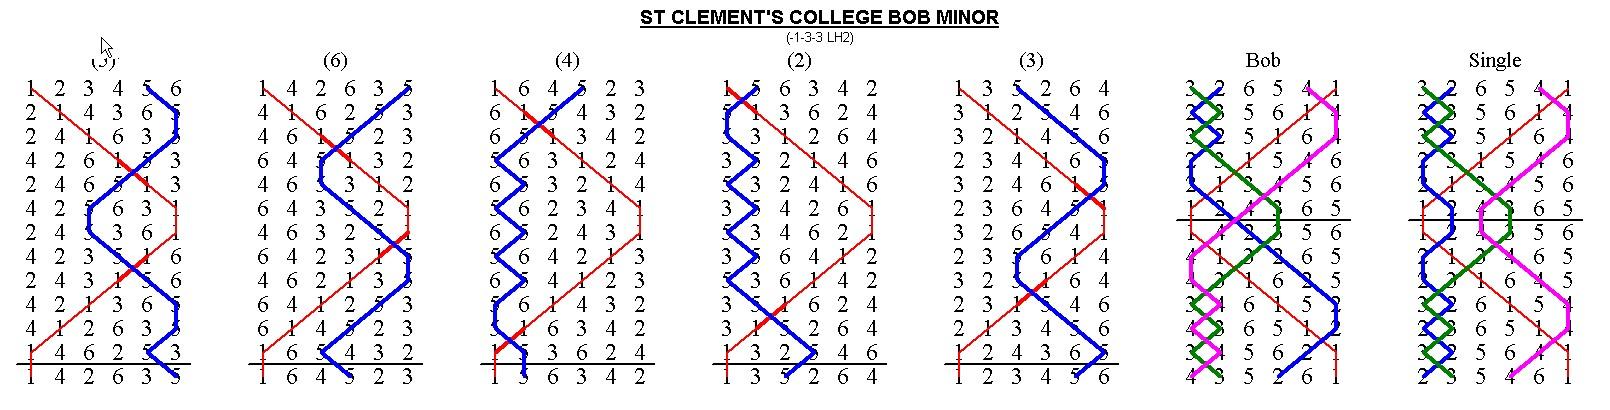 Bob Minor